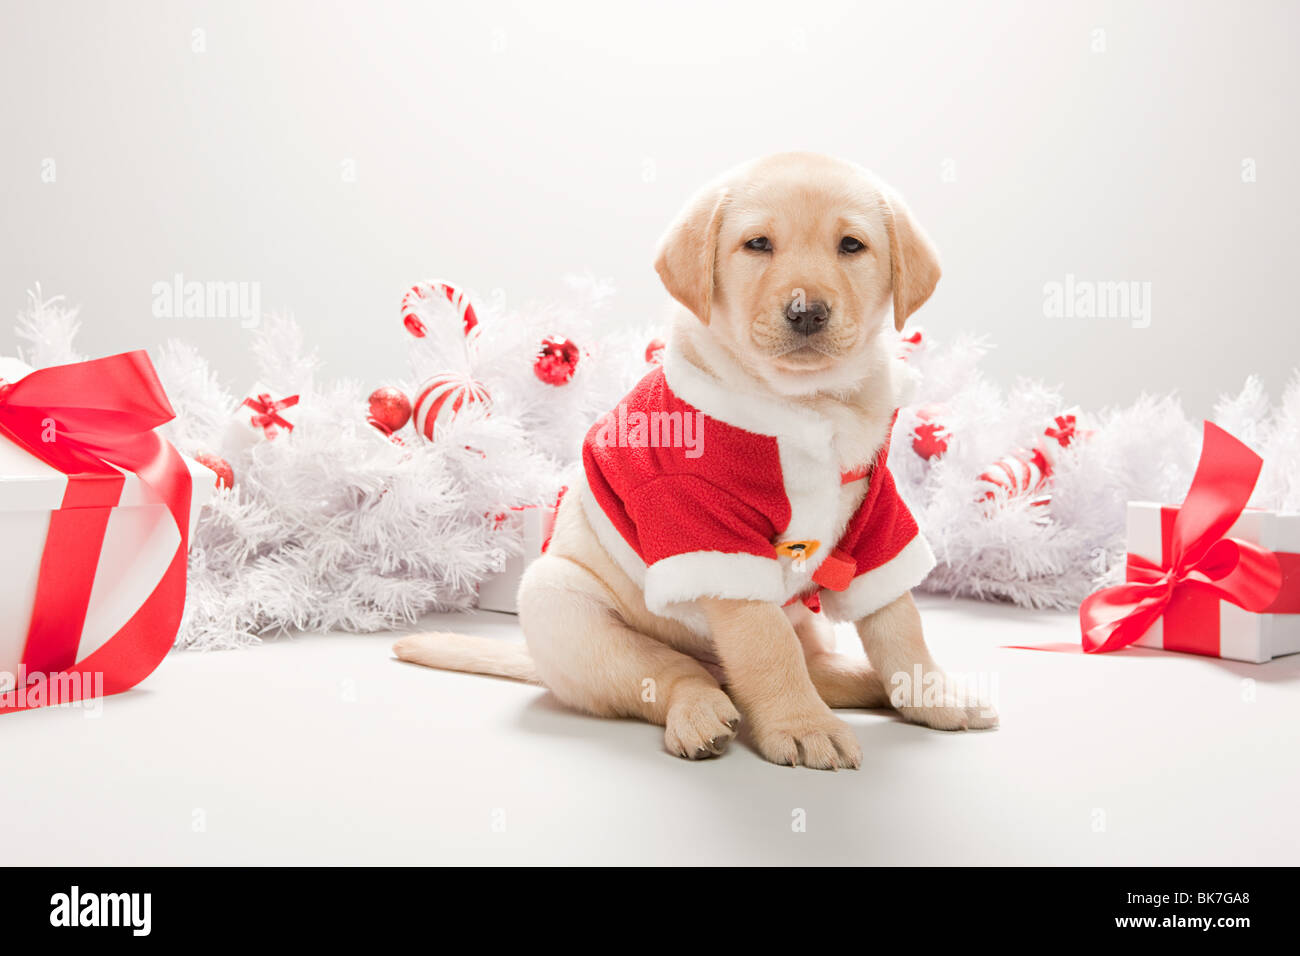 Labrador Christmas High Resolution Stock Photography And Images Alamy